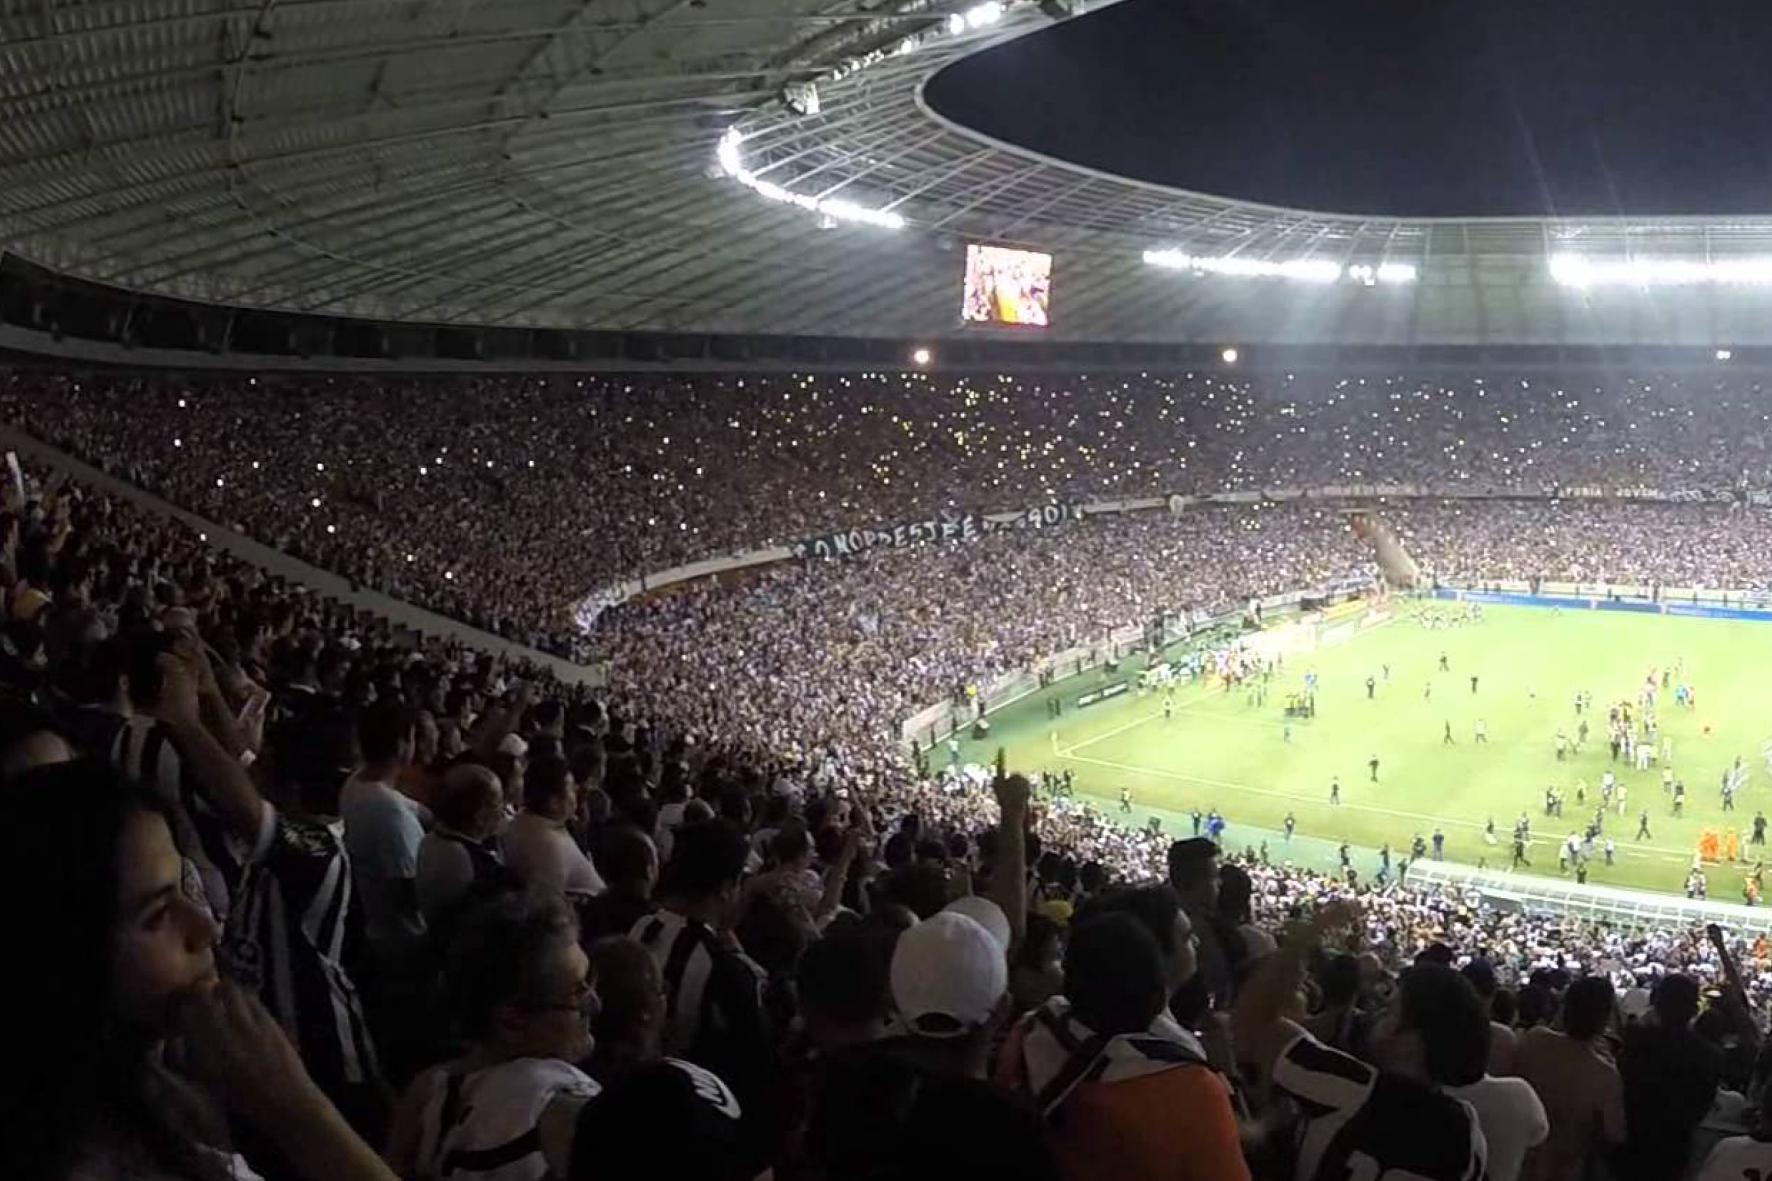 Resultado de imagem para torcida no estádio nordeste